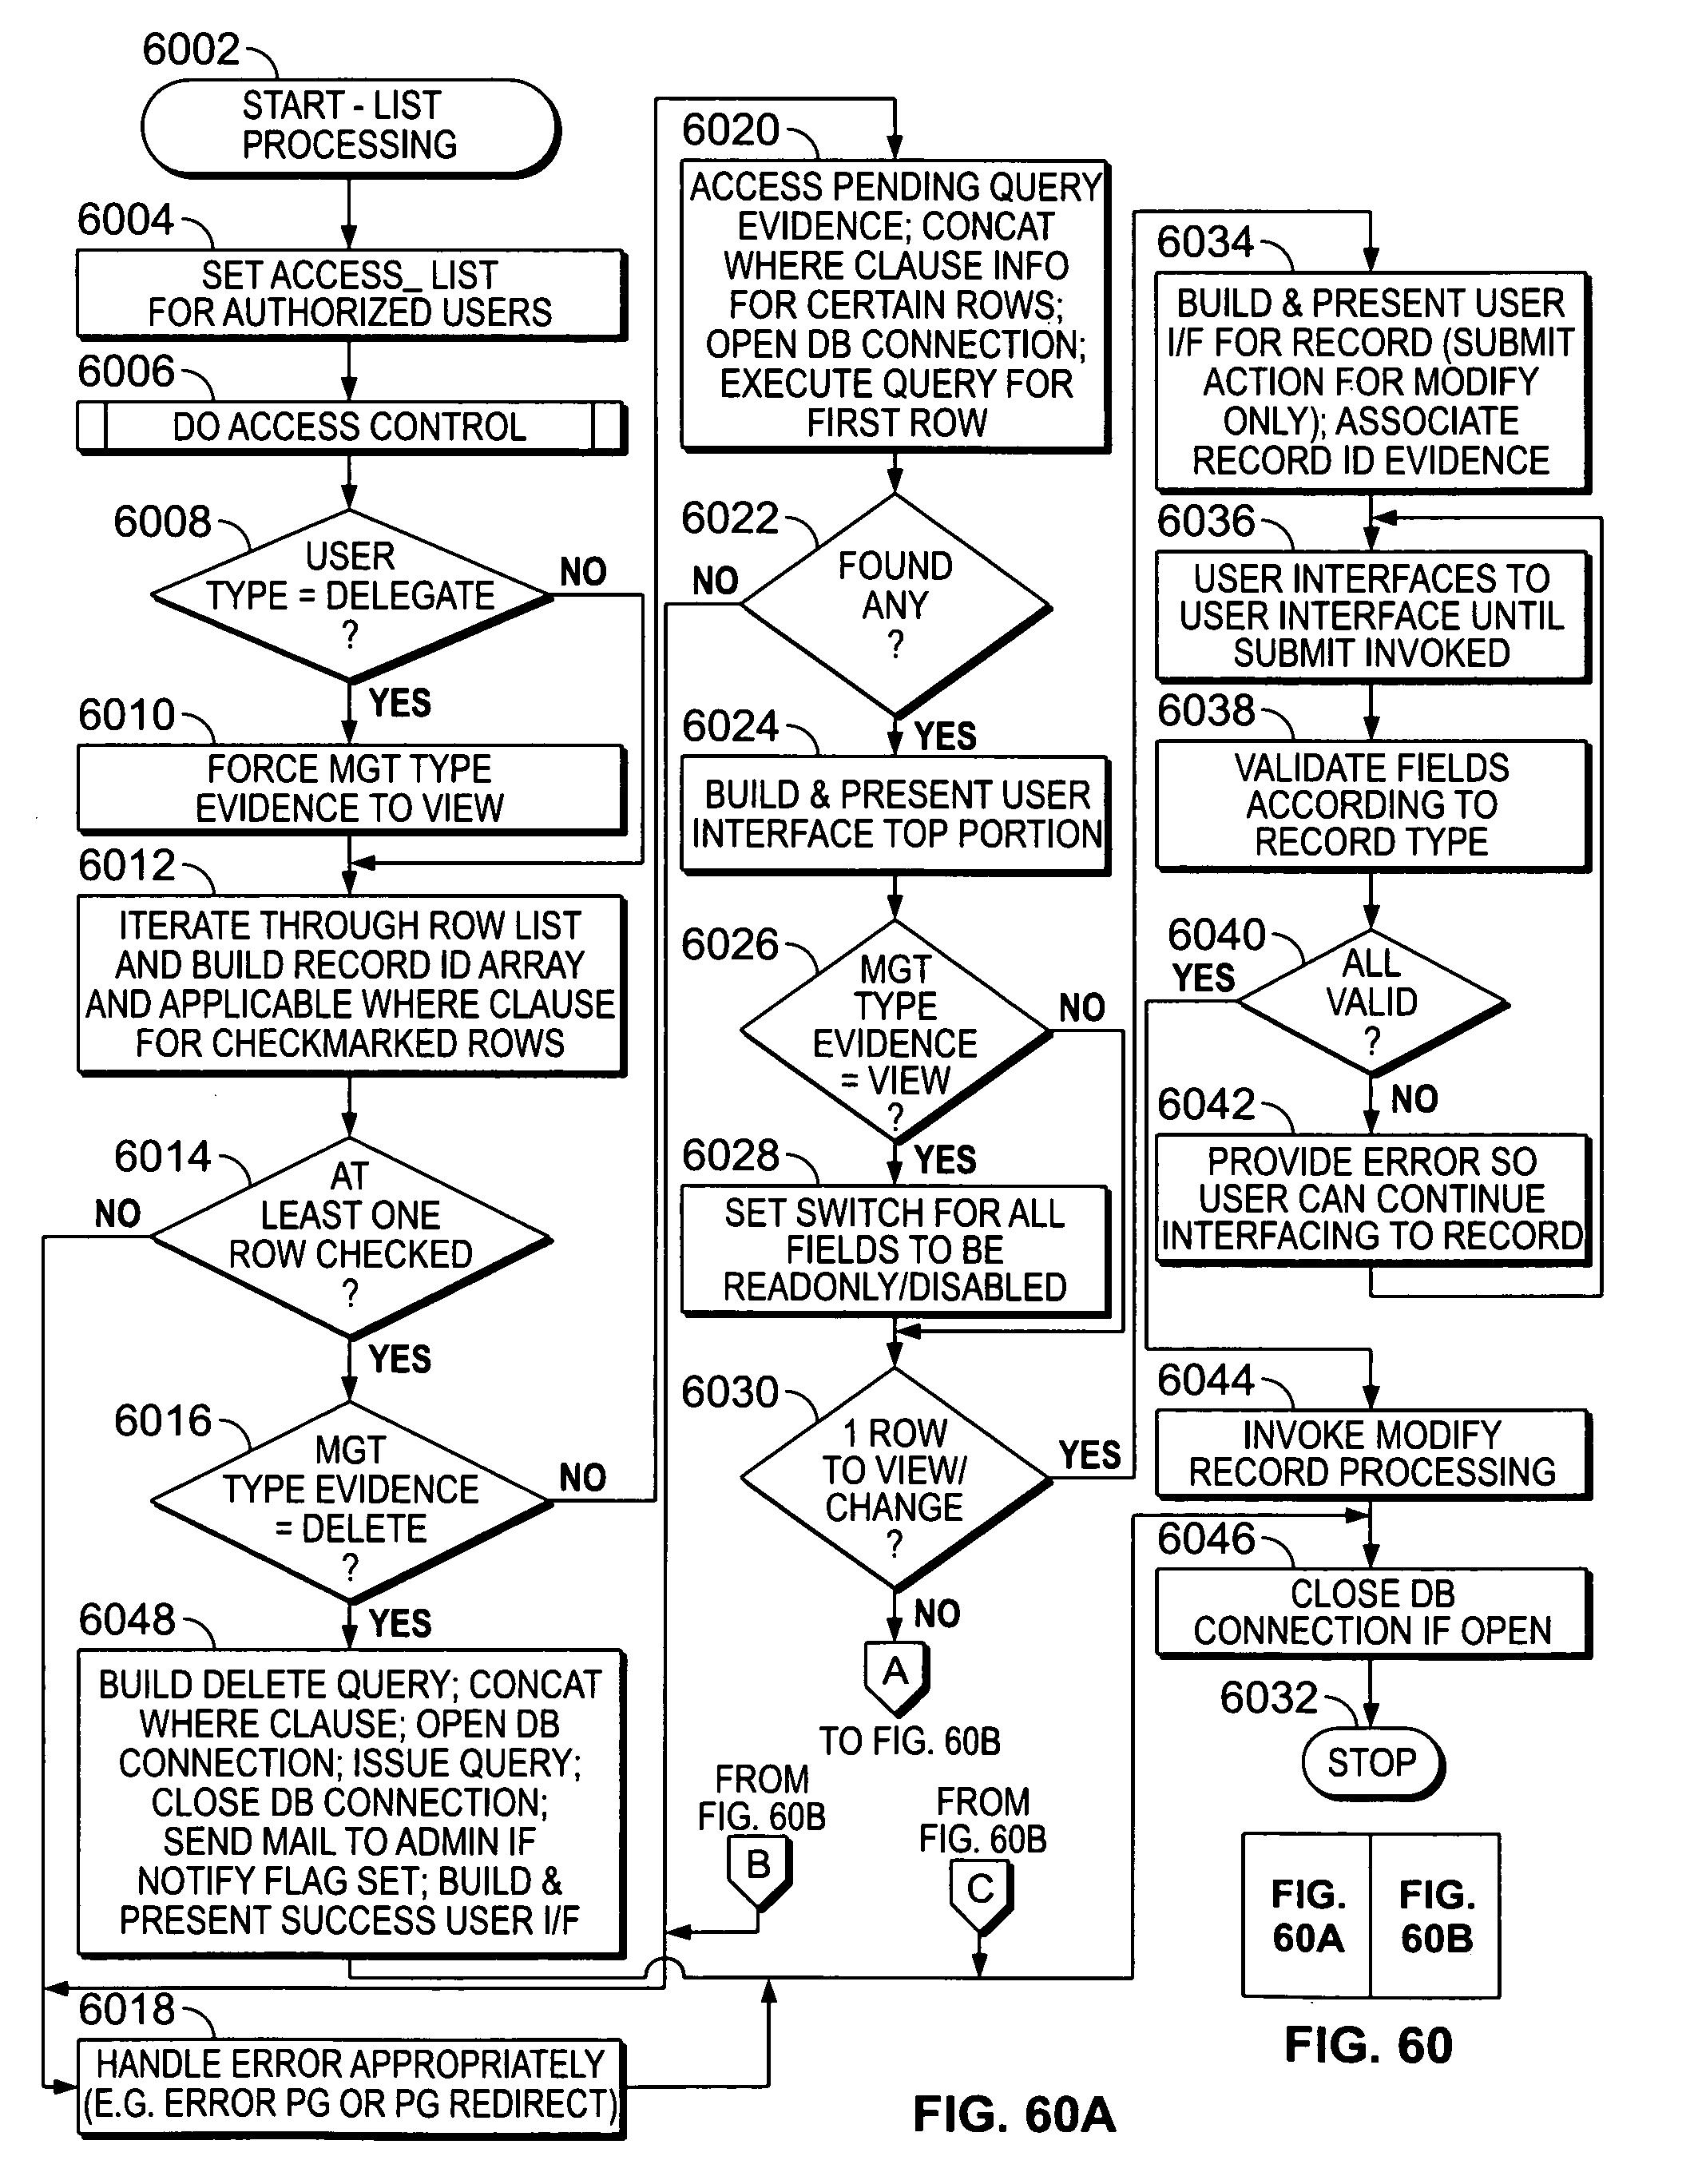 Patent US 8,489,669 B2